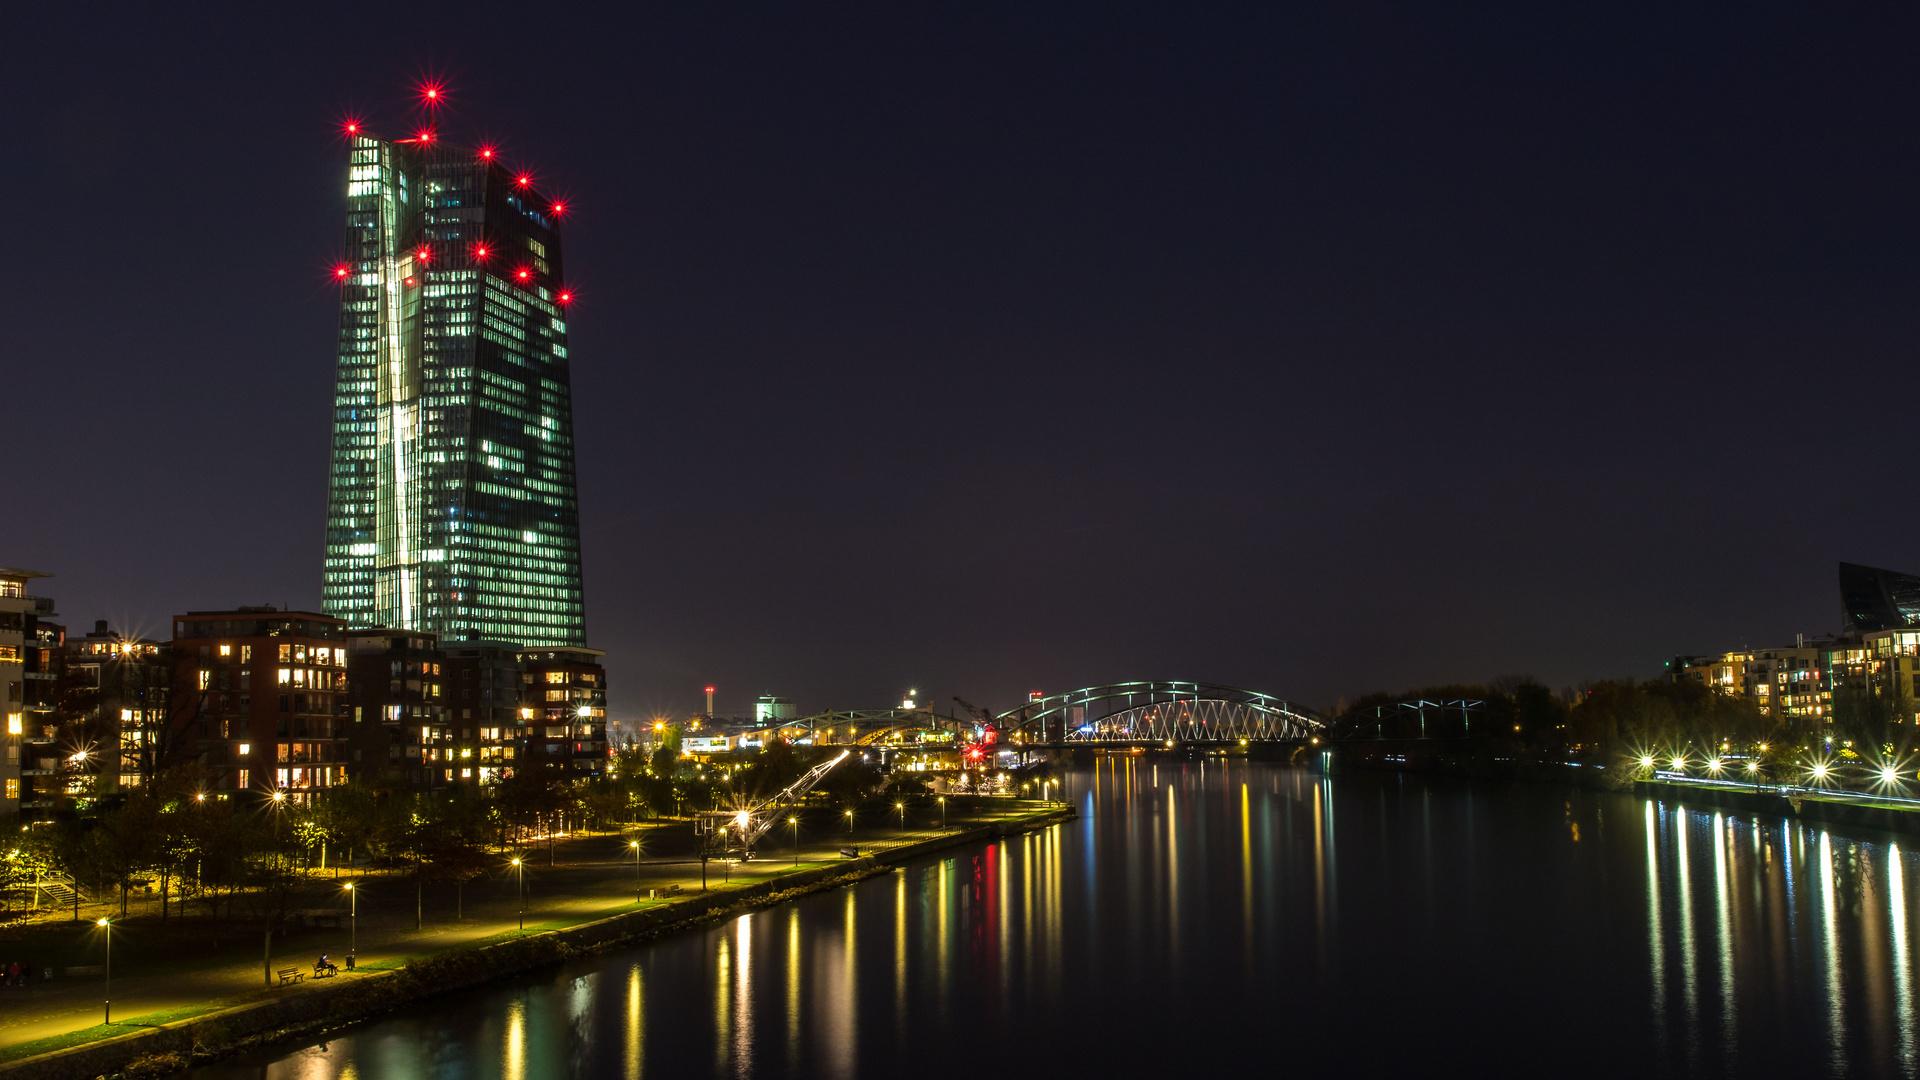 EZB Frankfurt/Main